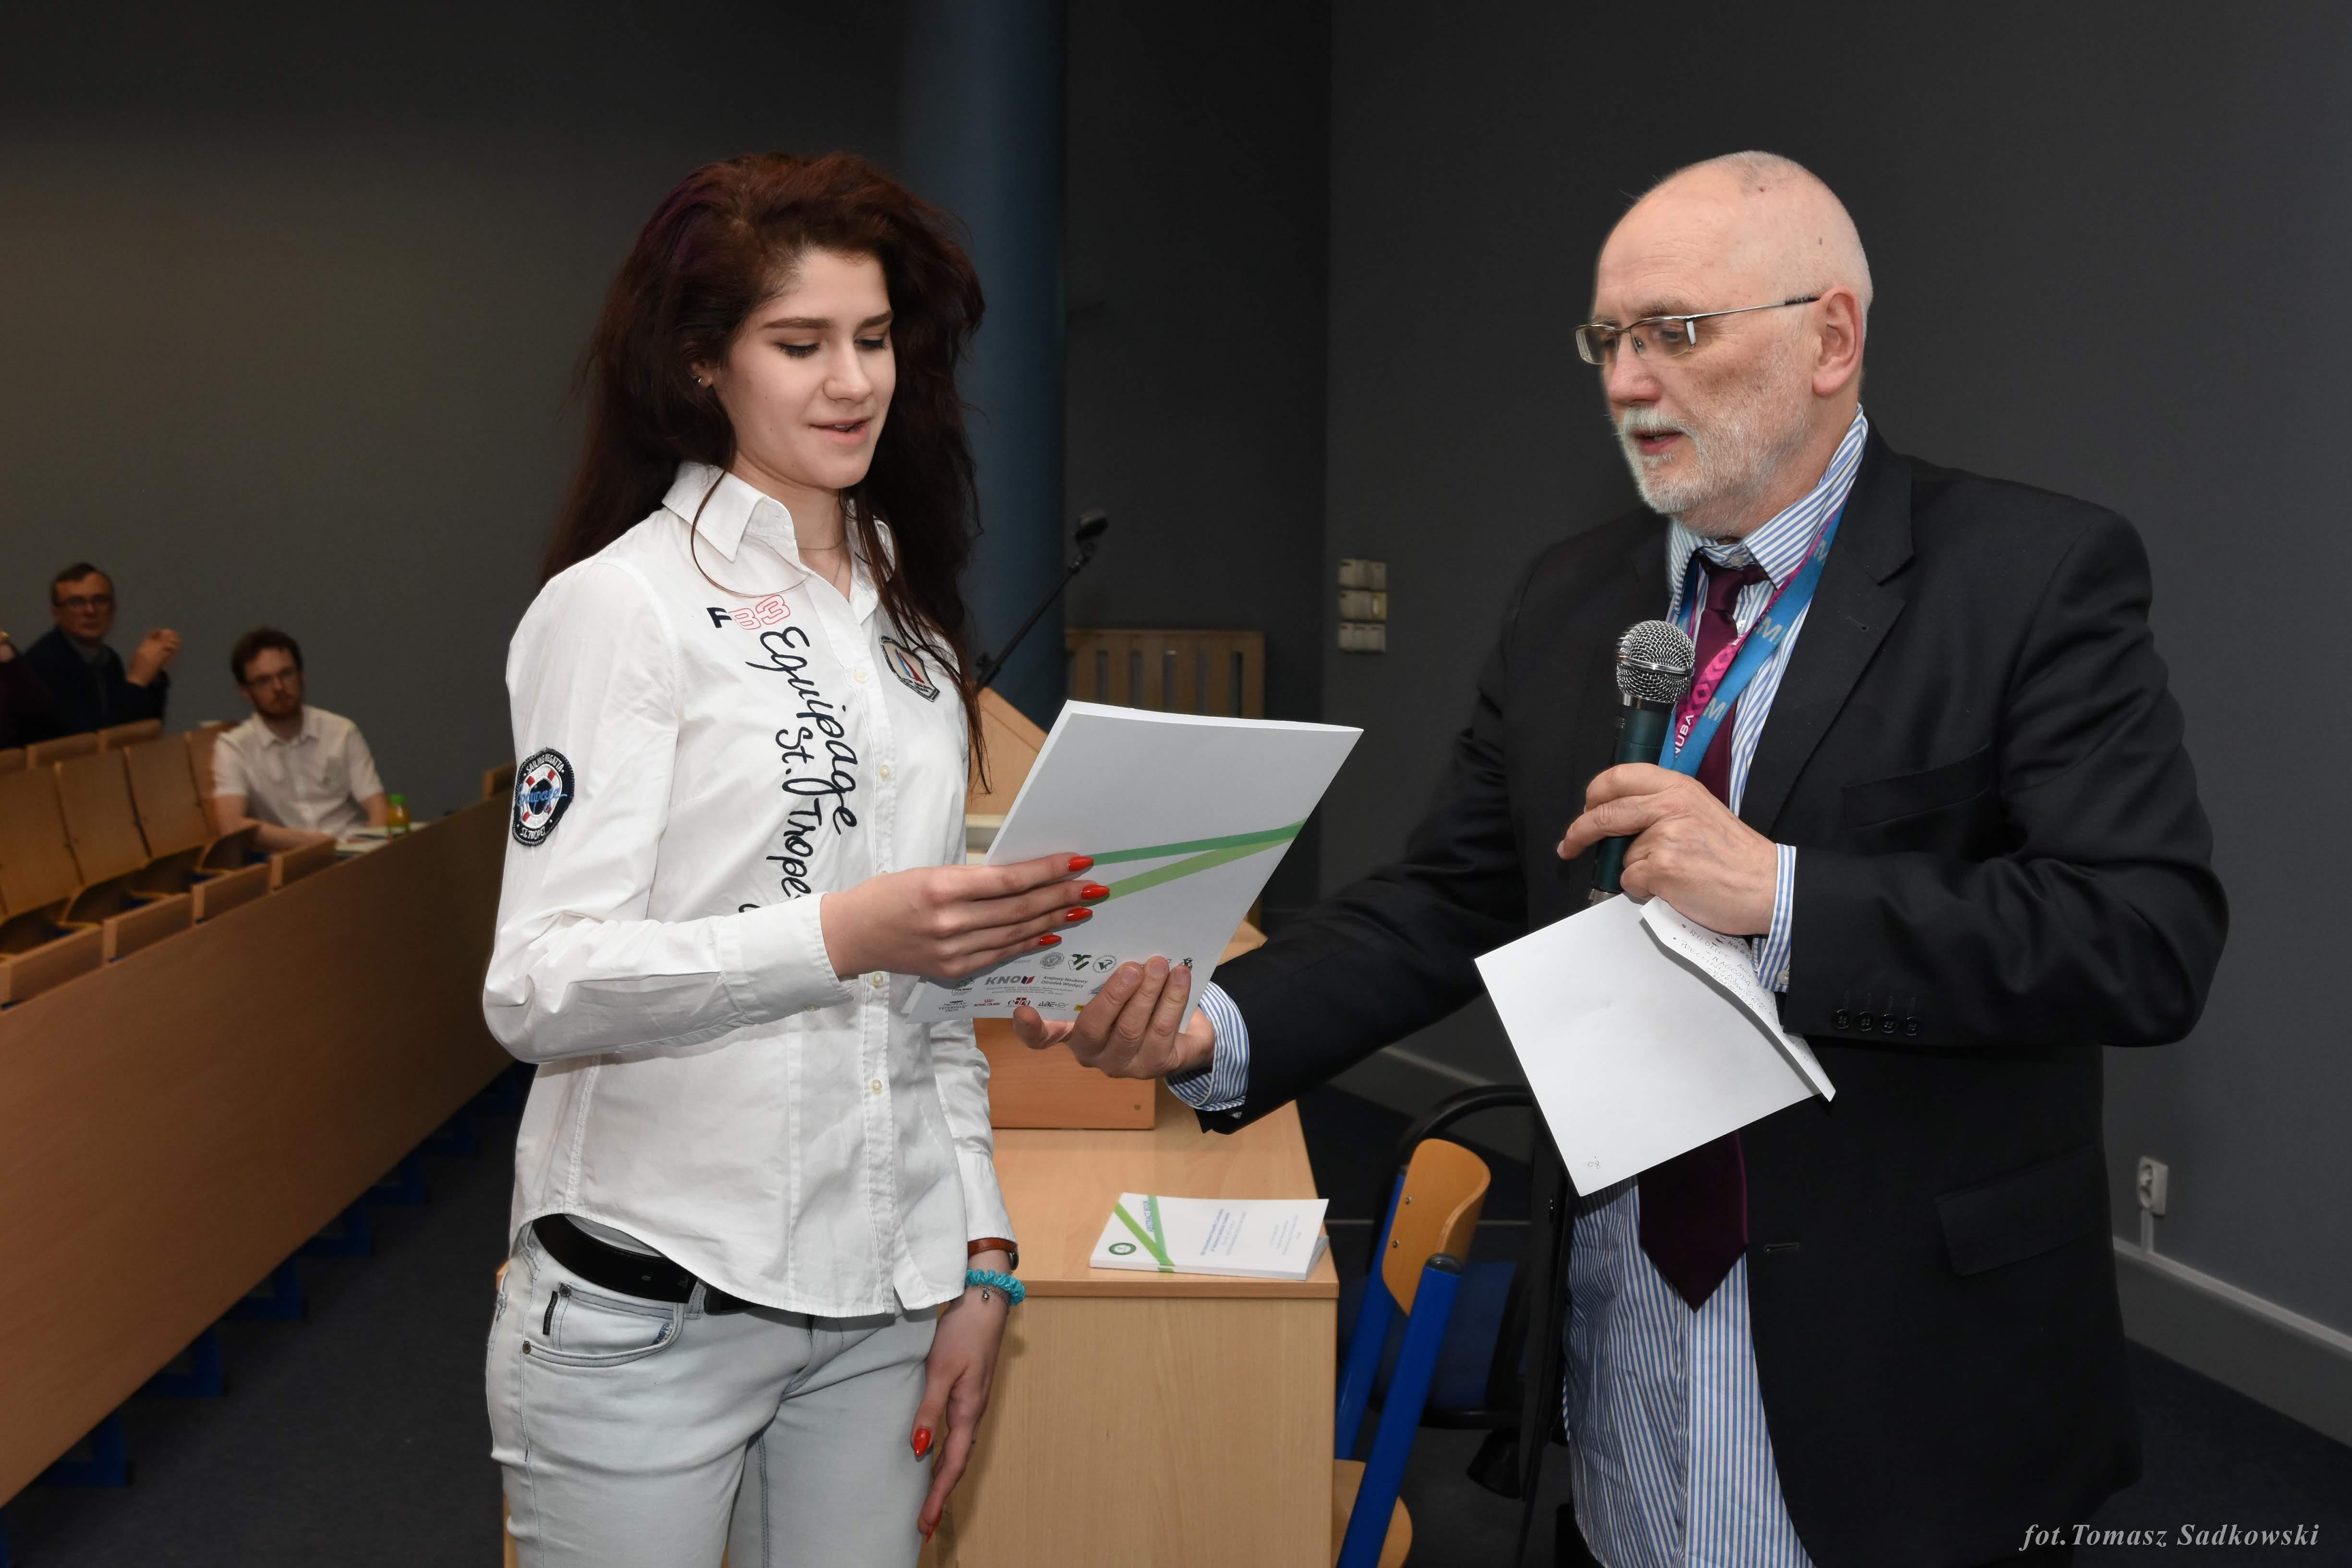 V. Gladyshko receiving a special award funded by Polish Equestrian Association